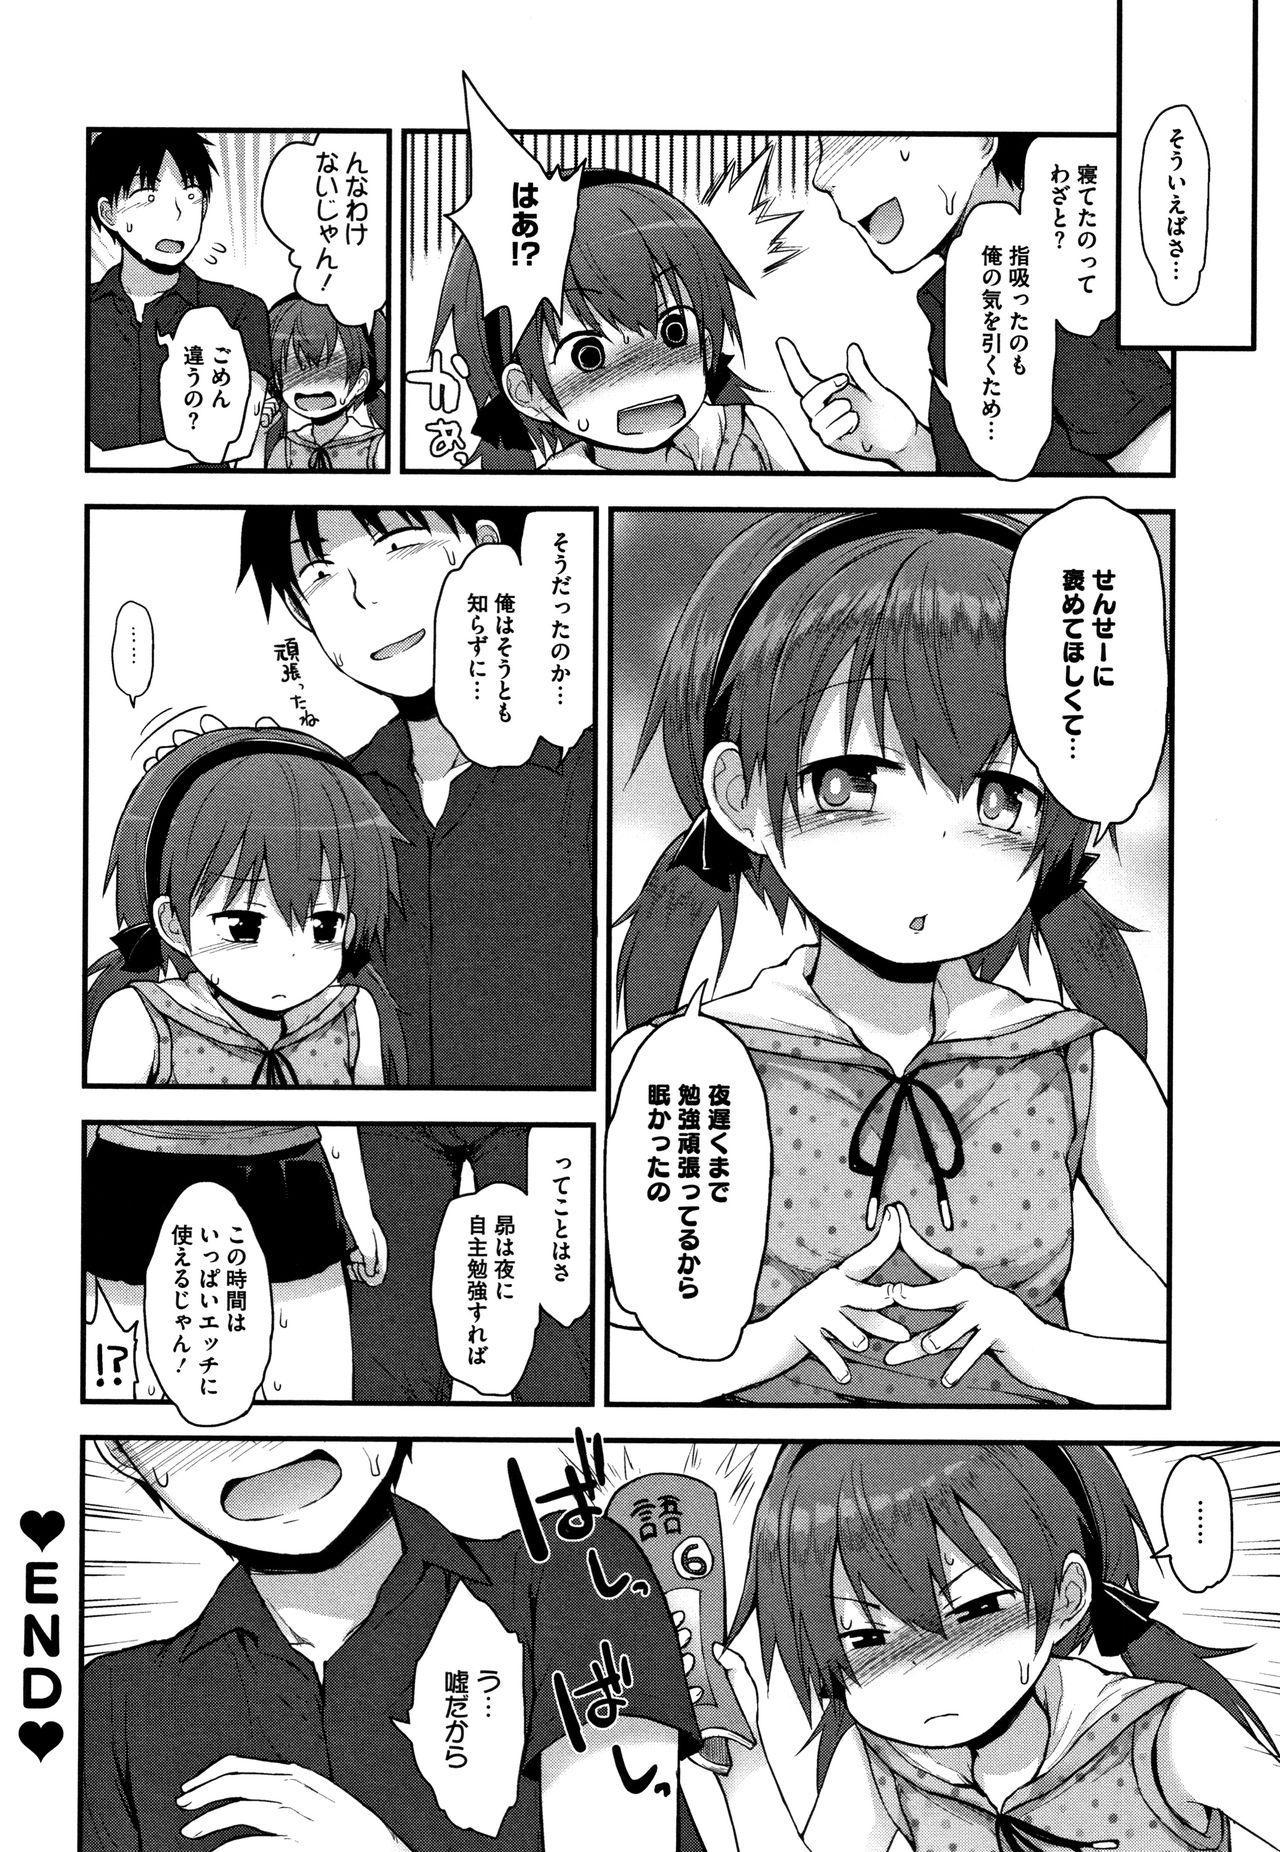 Chiisana Koukishin 122